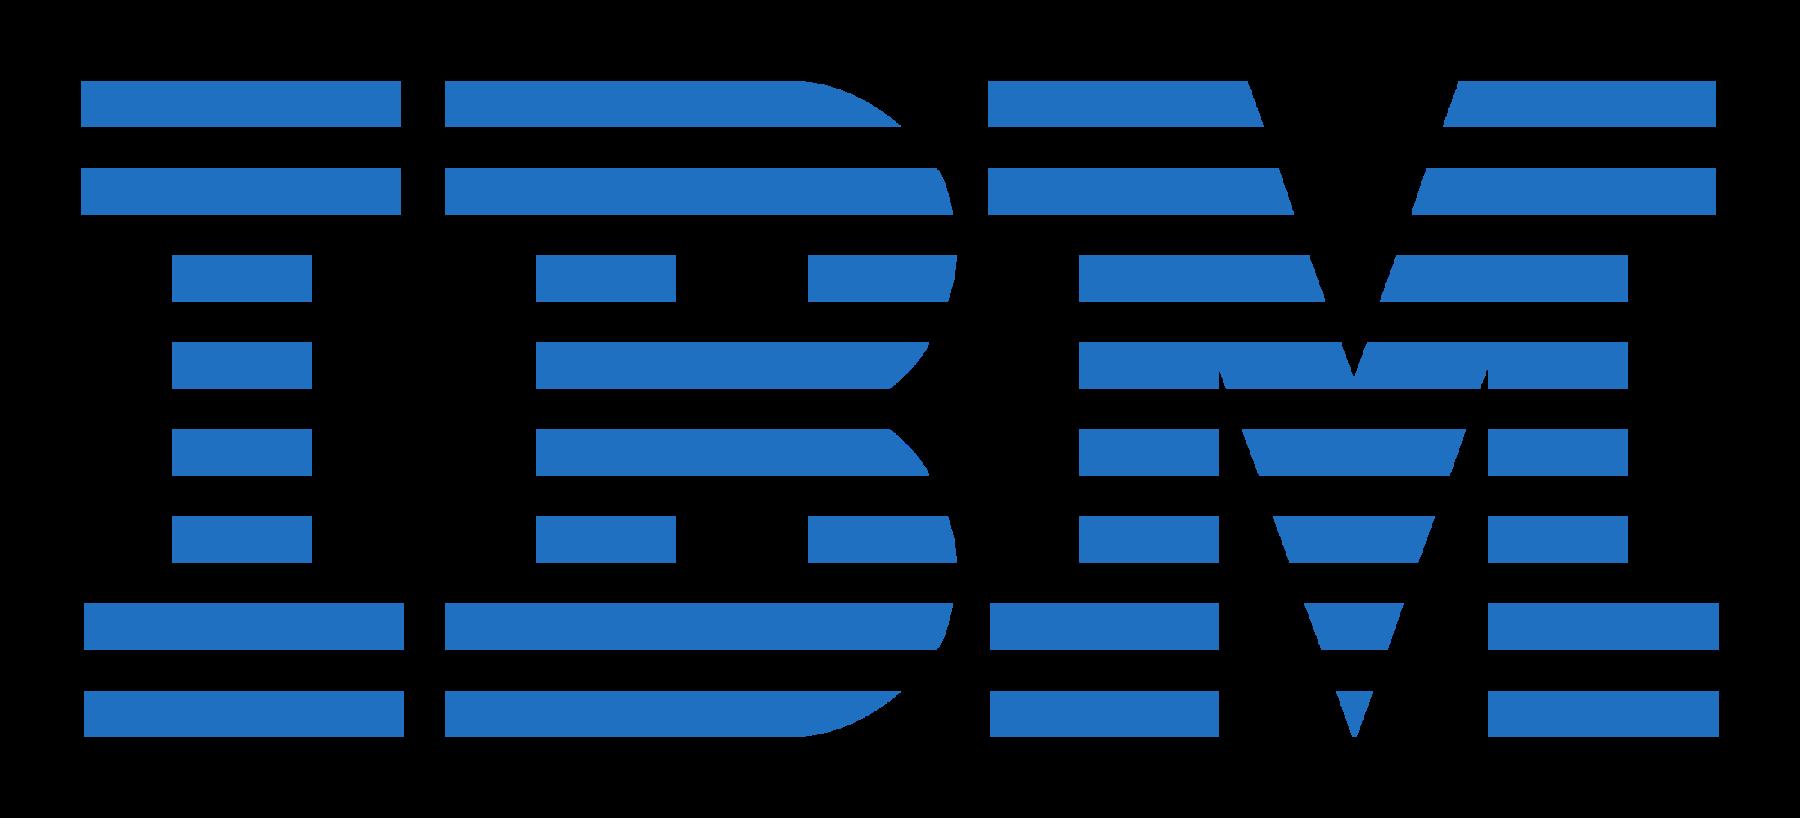 License Management Service for IBM